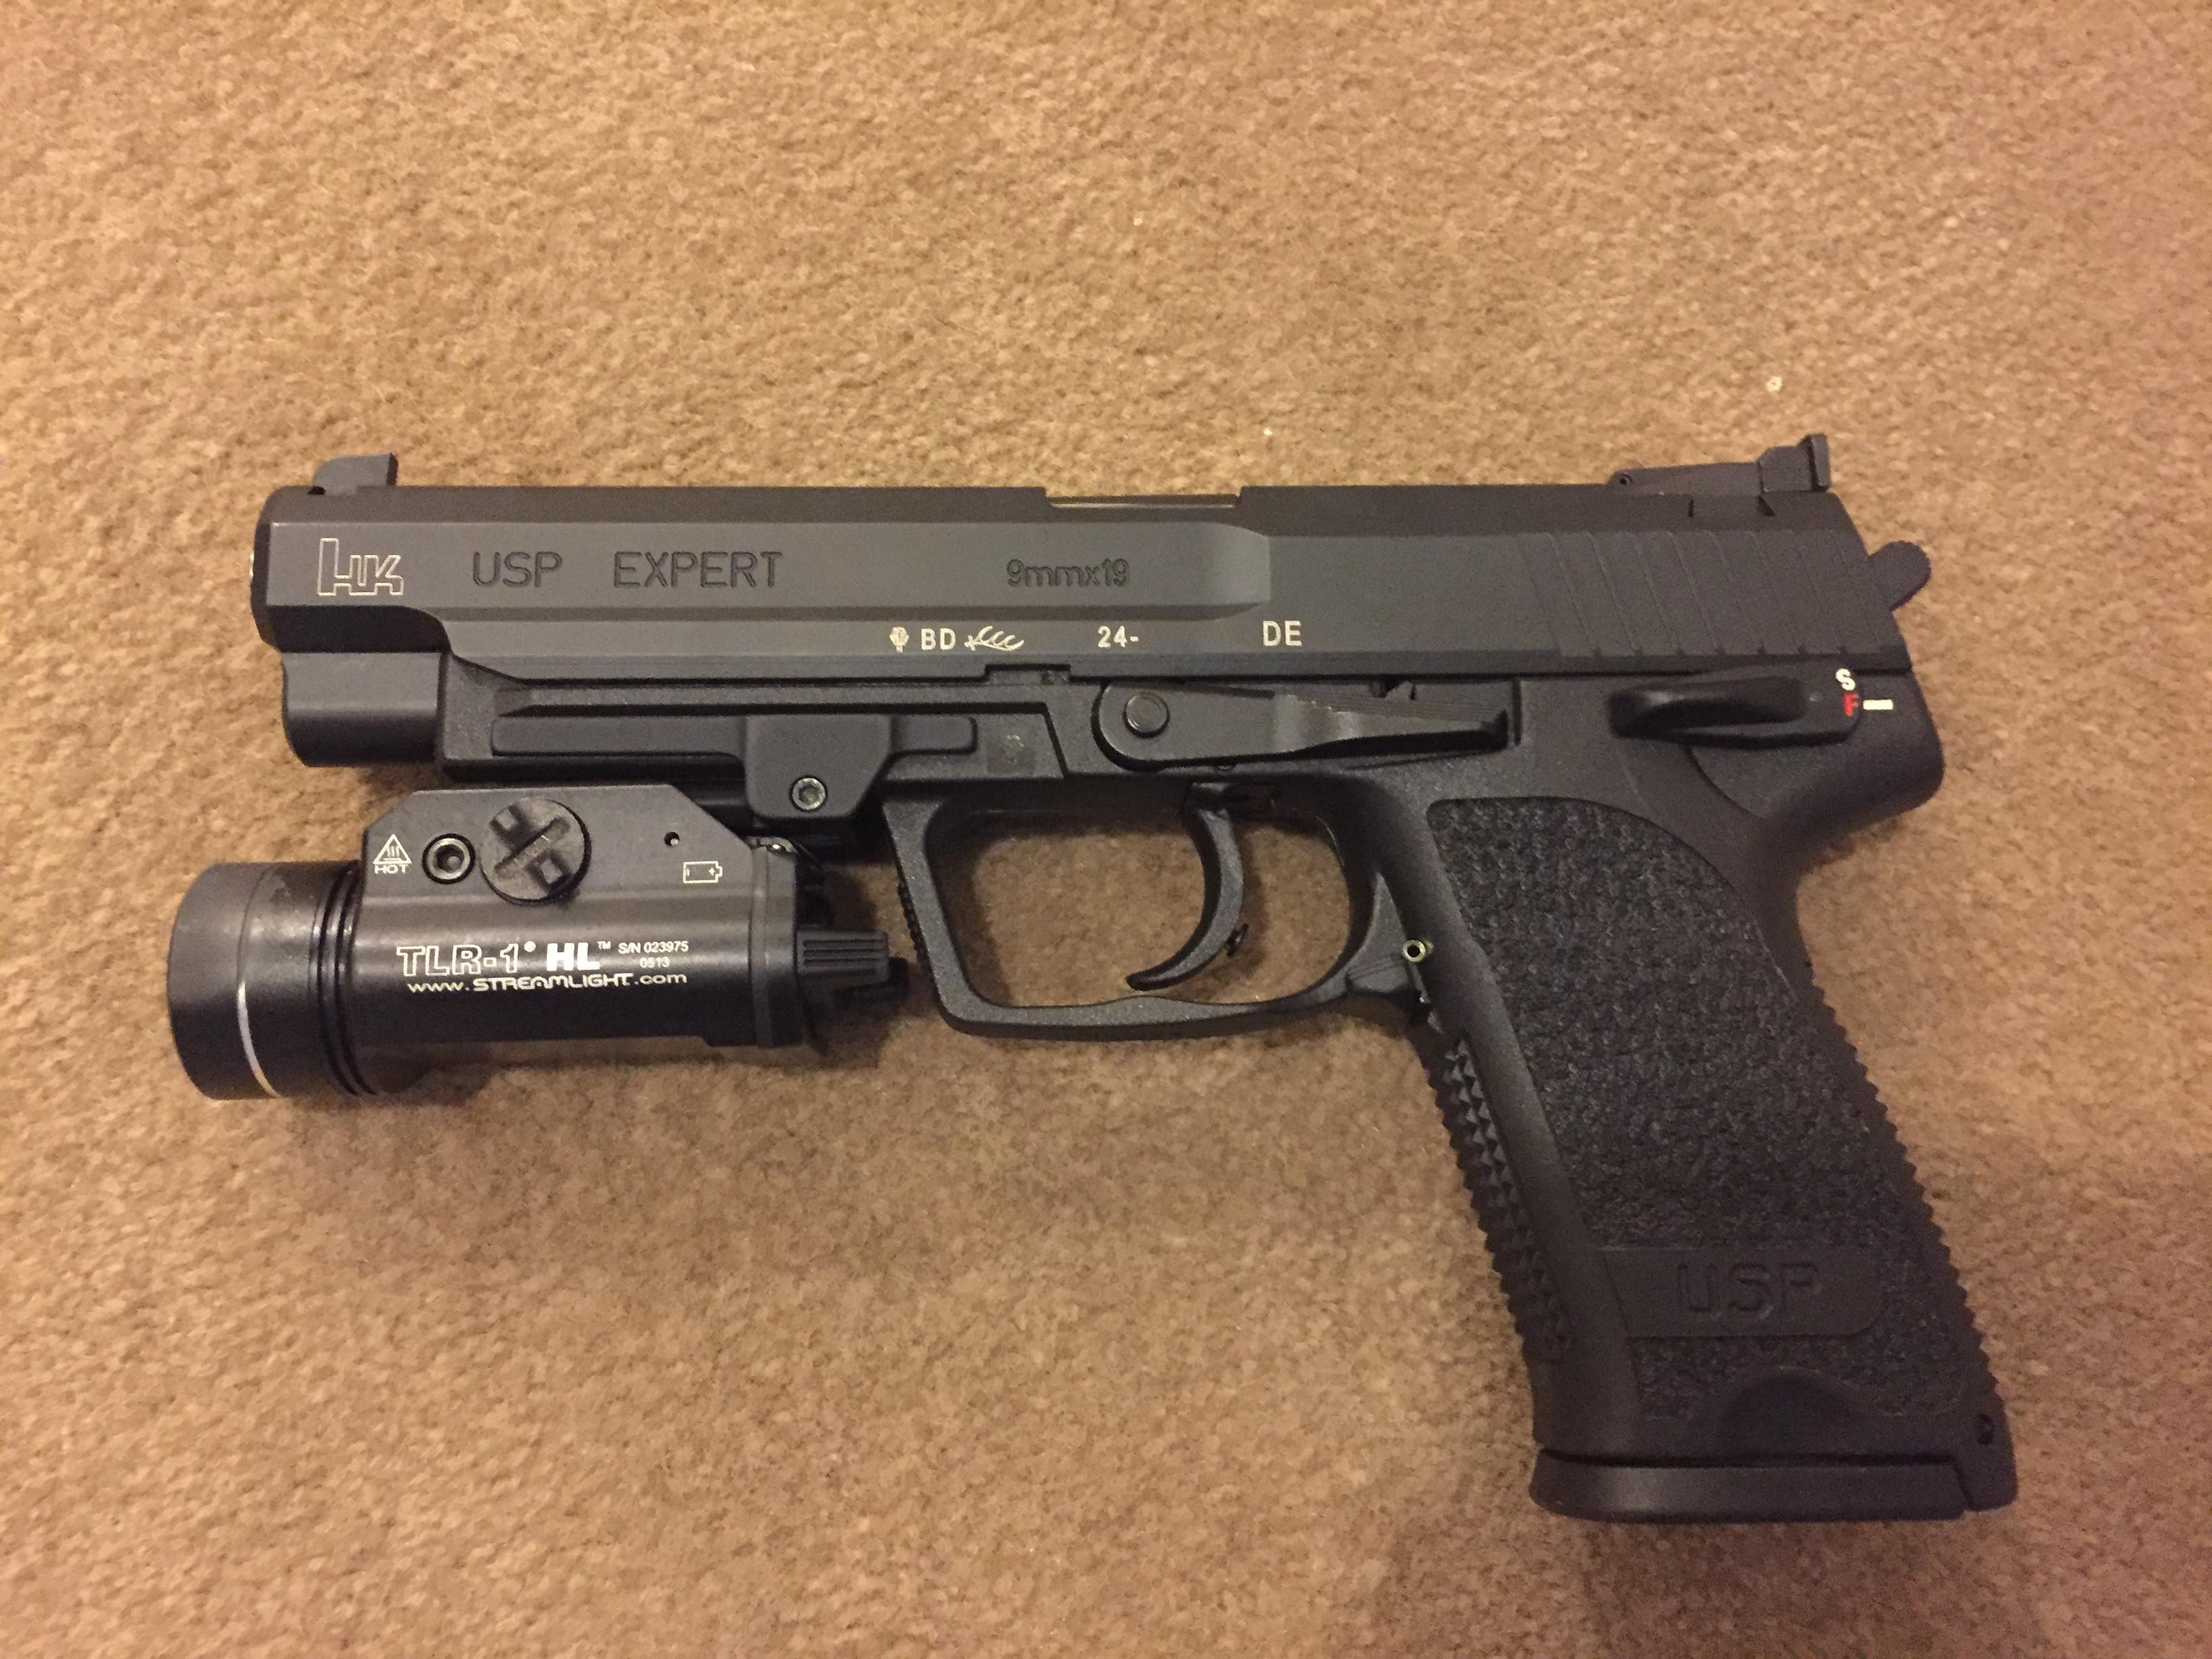 WTS - USP Expert 9mm (SOLD)-img_5790.jpg